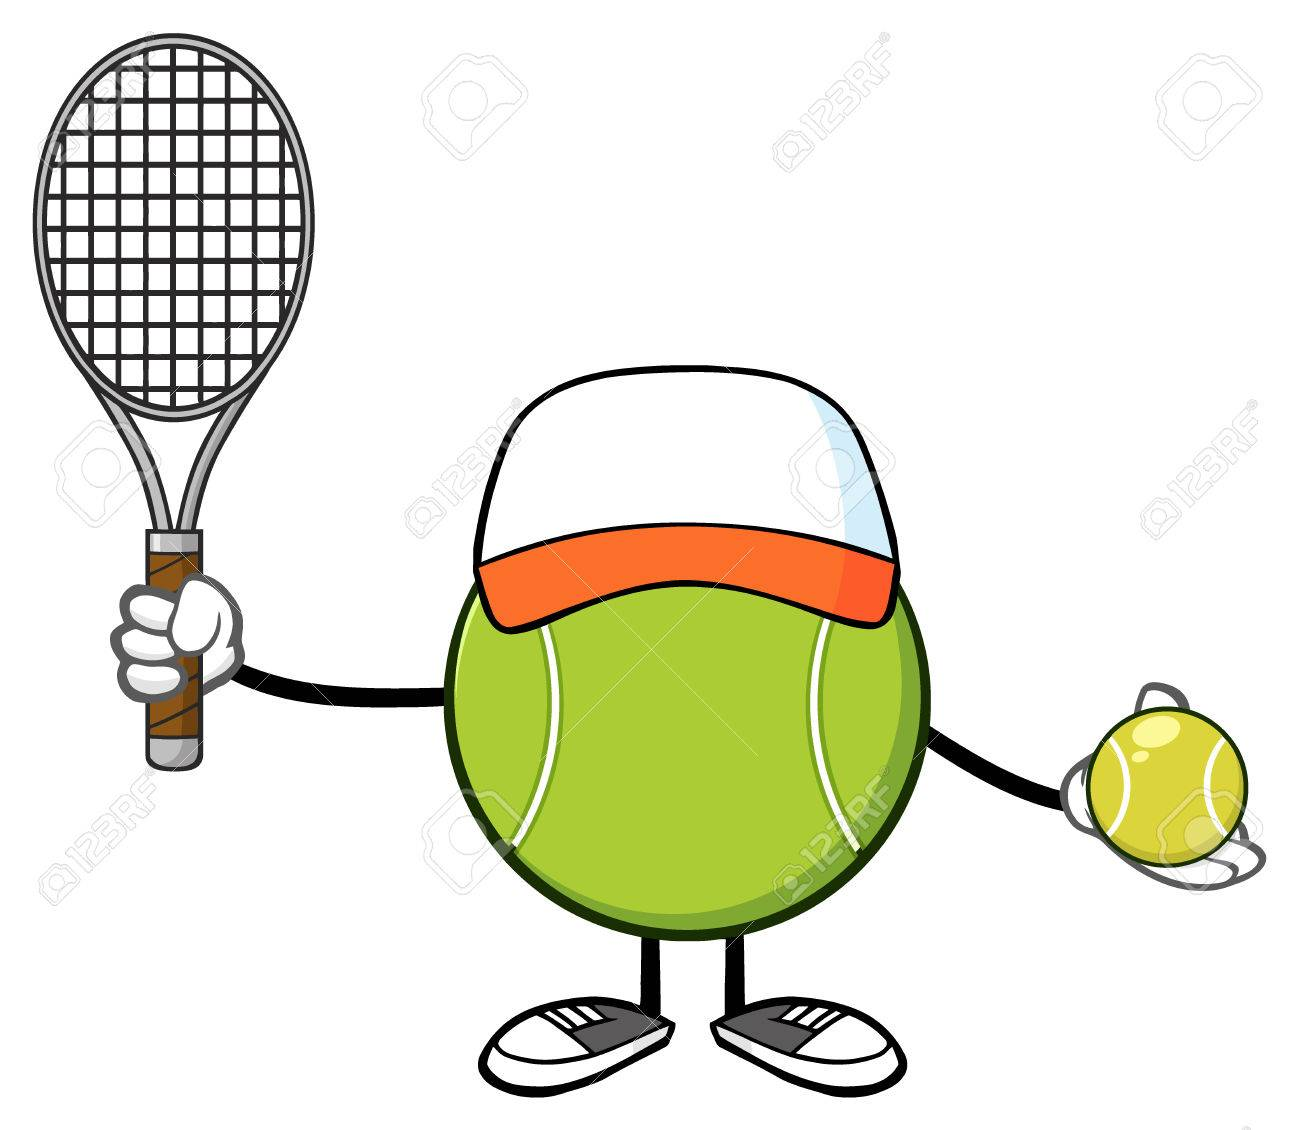 Tennis ball mascot stock photos tennis ball mascot stock photography - Stock Photo Tennis Ball Faceless Player Cartoon Mascot Character With Hat Holding A Tennis Ball And Racket